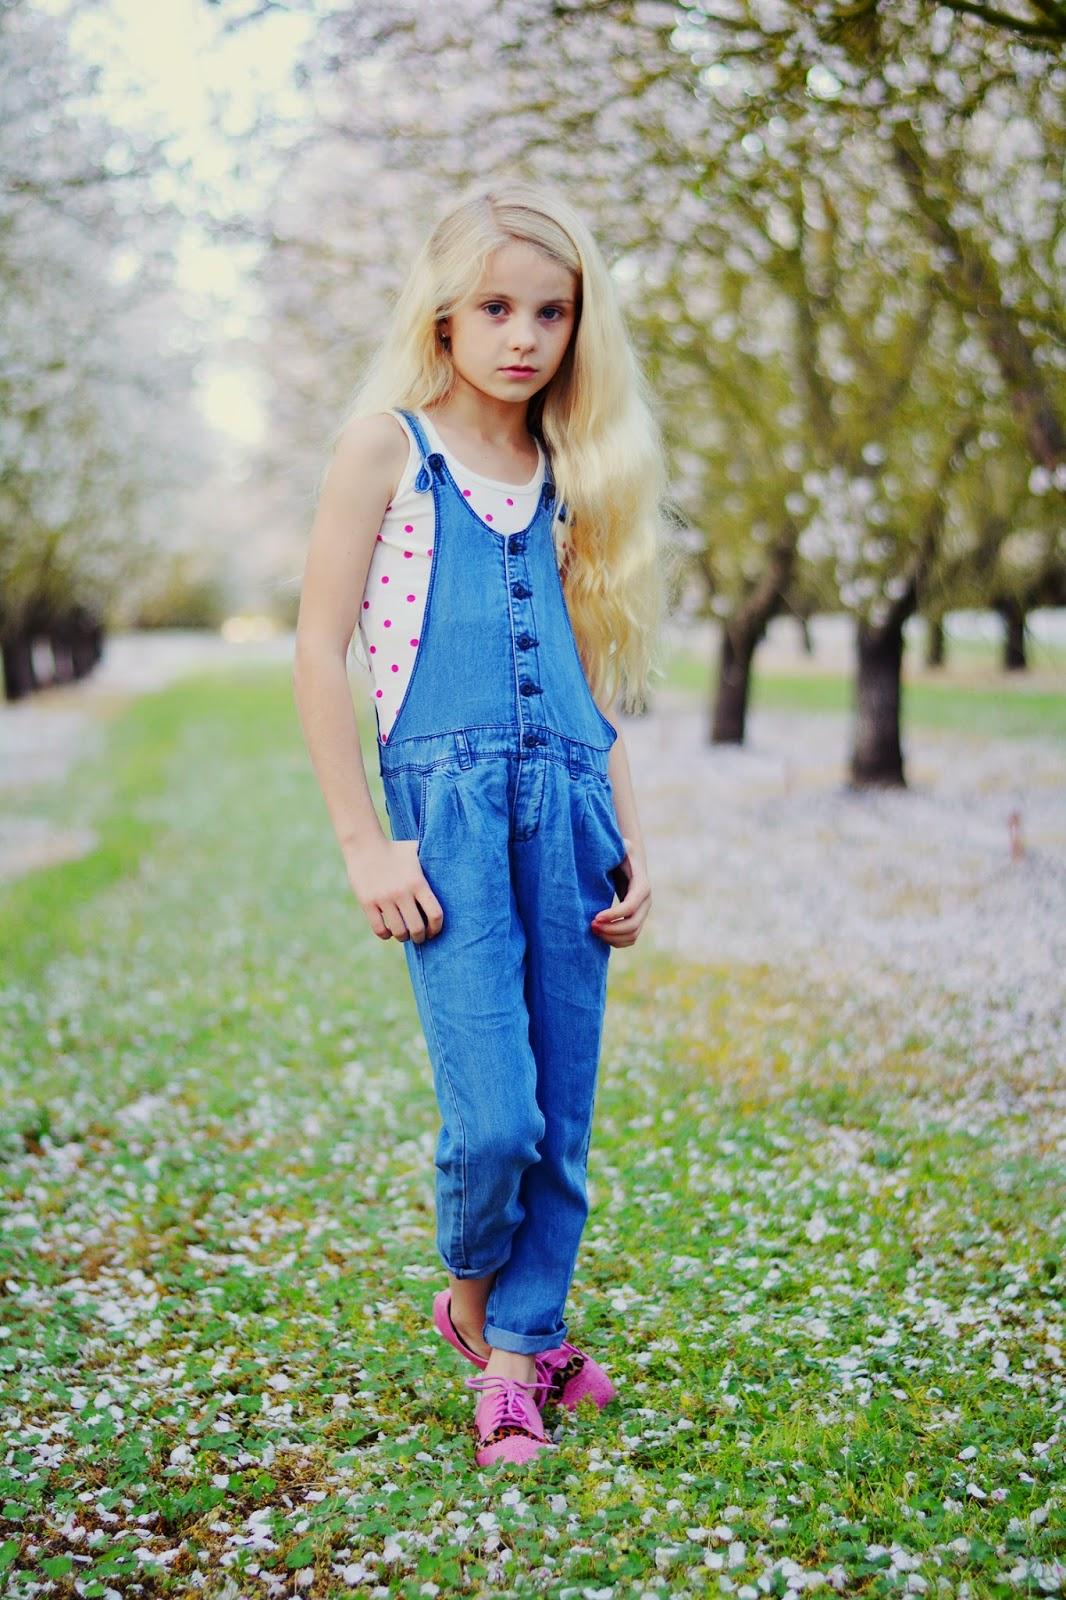 cf1695e91e47 Mini Fashion Addicts  ROMPER OBSESSED